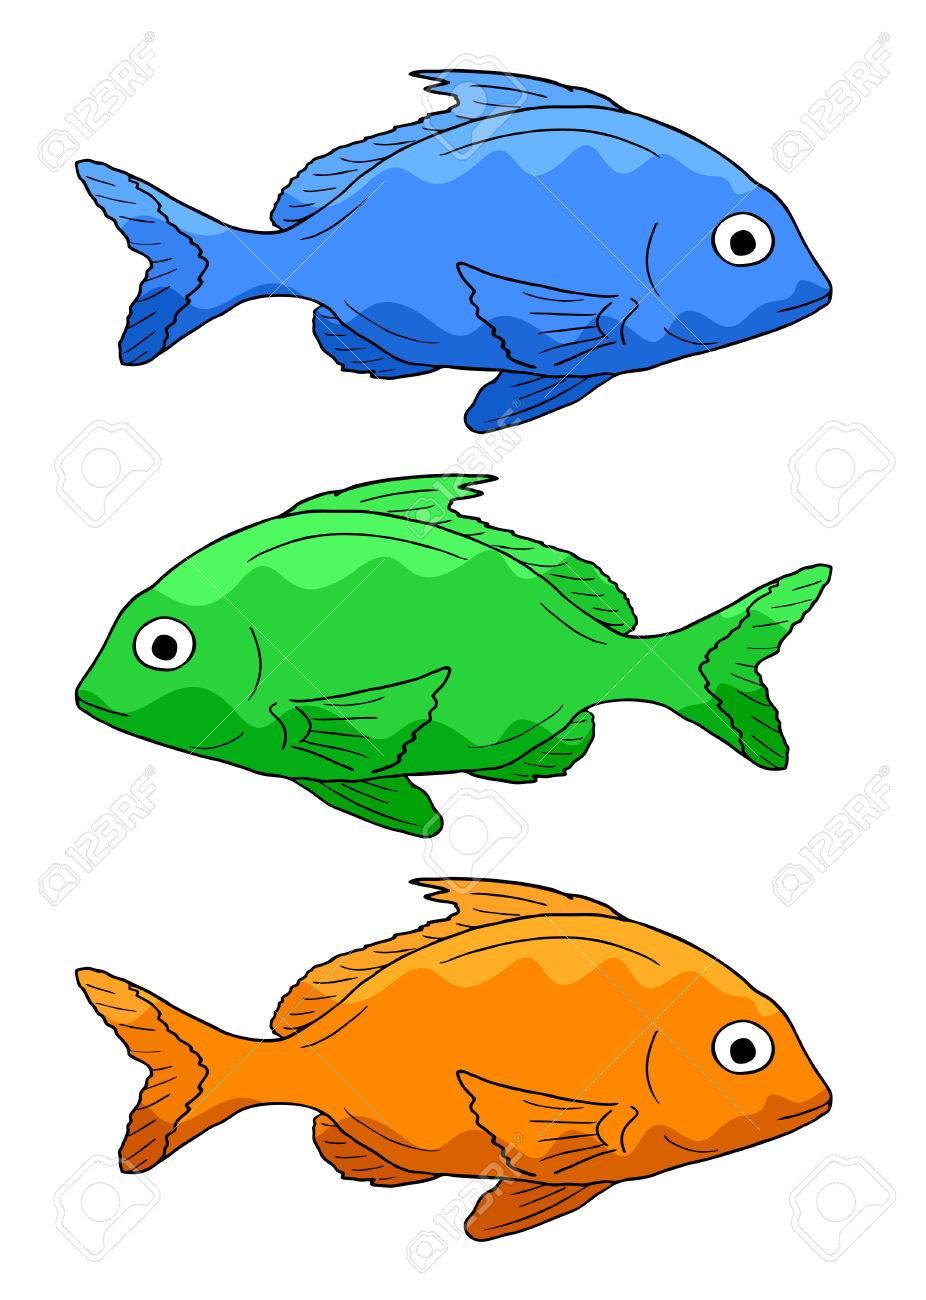 44734909-three-fishes.jpg